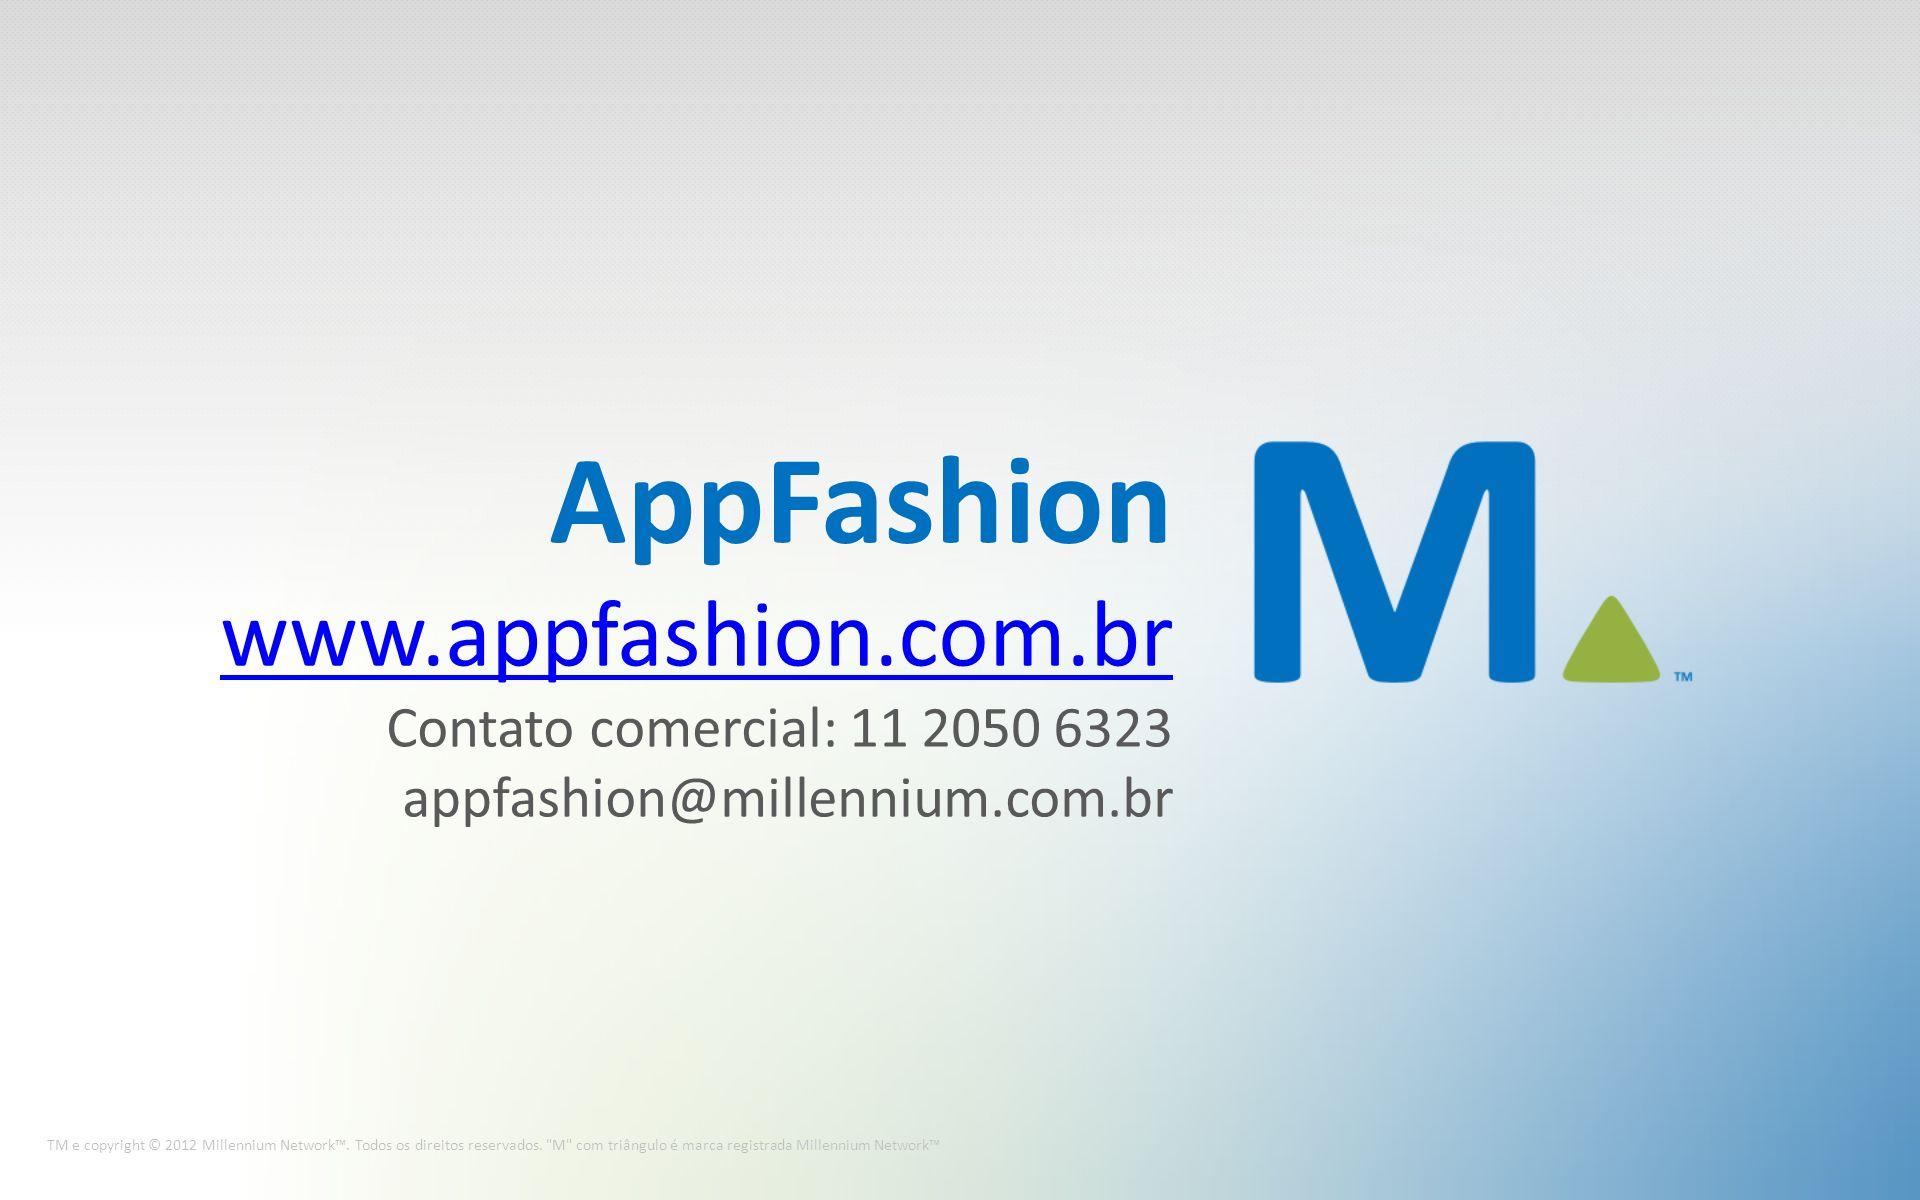 AppFashion www.appfashion.com.br Contato comercial: 11 2050 6323 appfashion@millennium.com.br TM e copyright © 2012 Millennium Network.